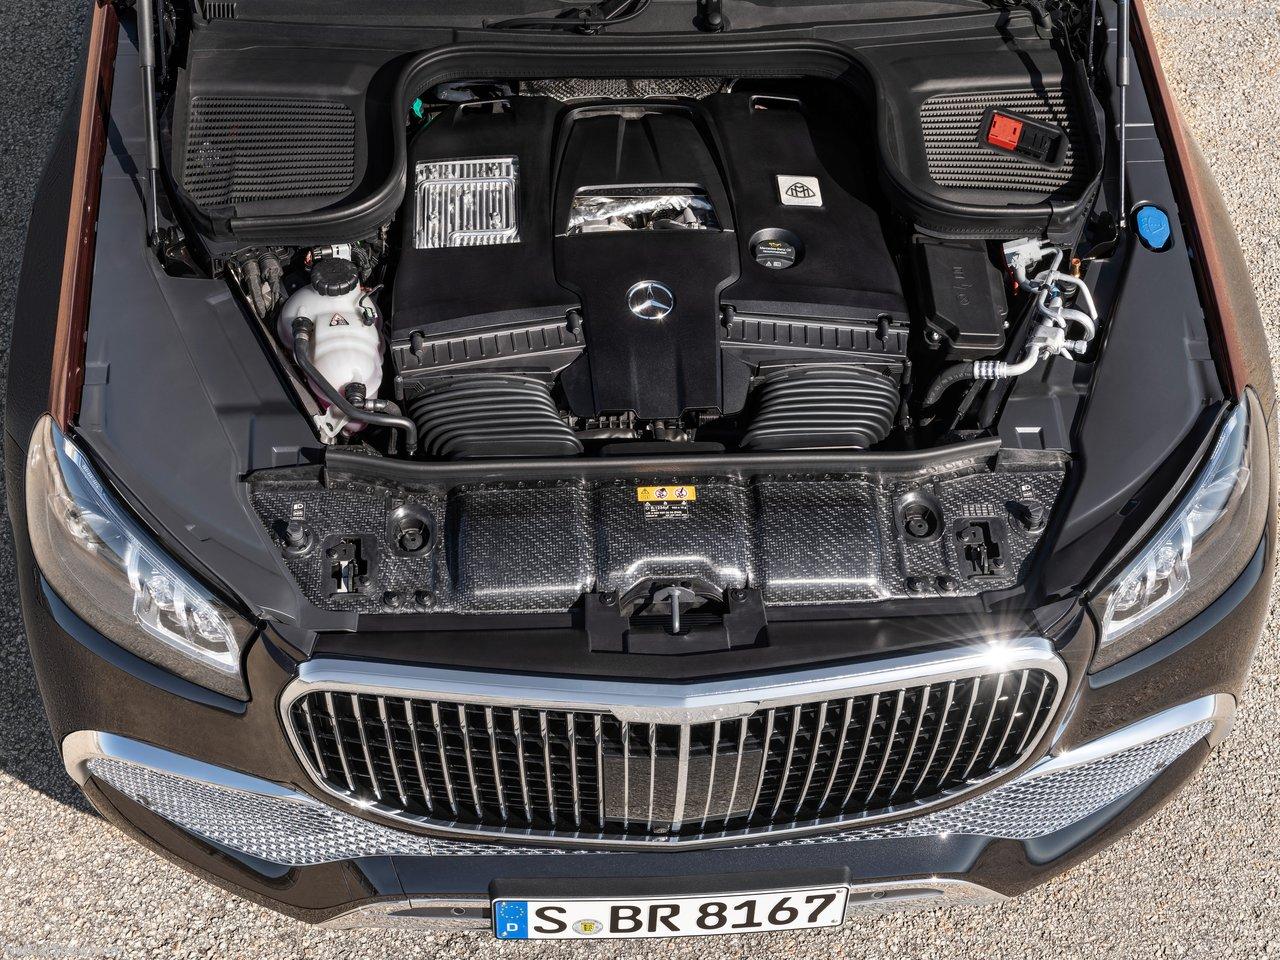 迈巴赫GLS 搭载 4.0T V8 48V轻混发动机